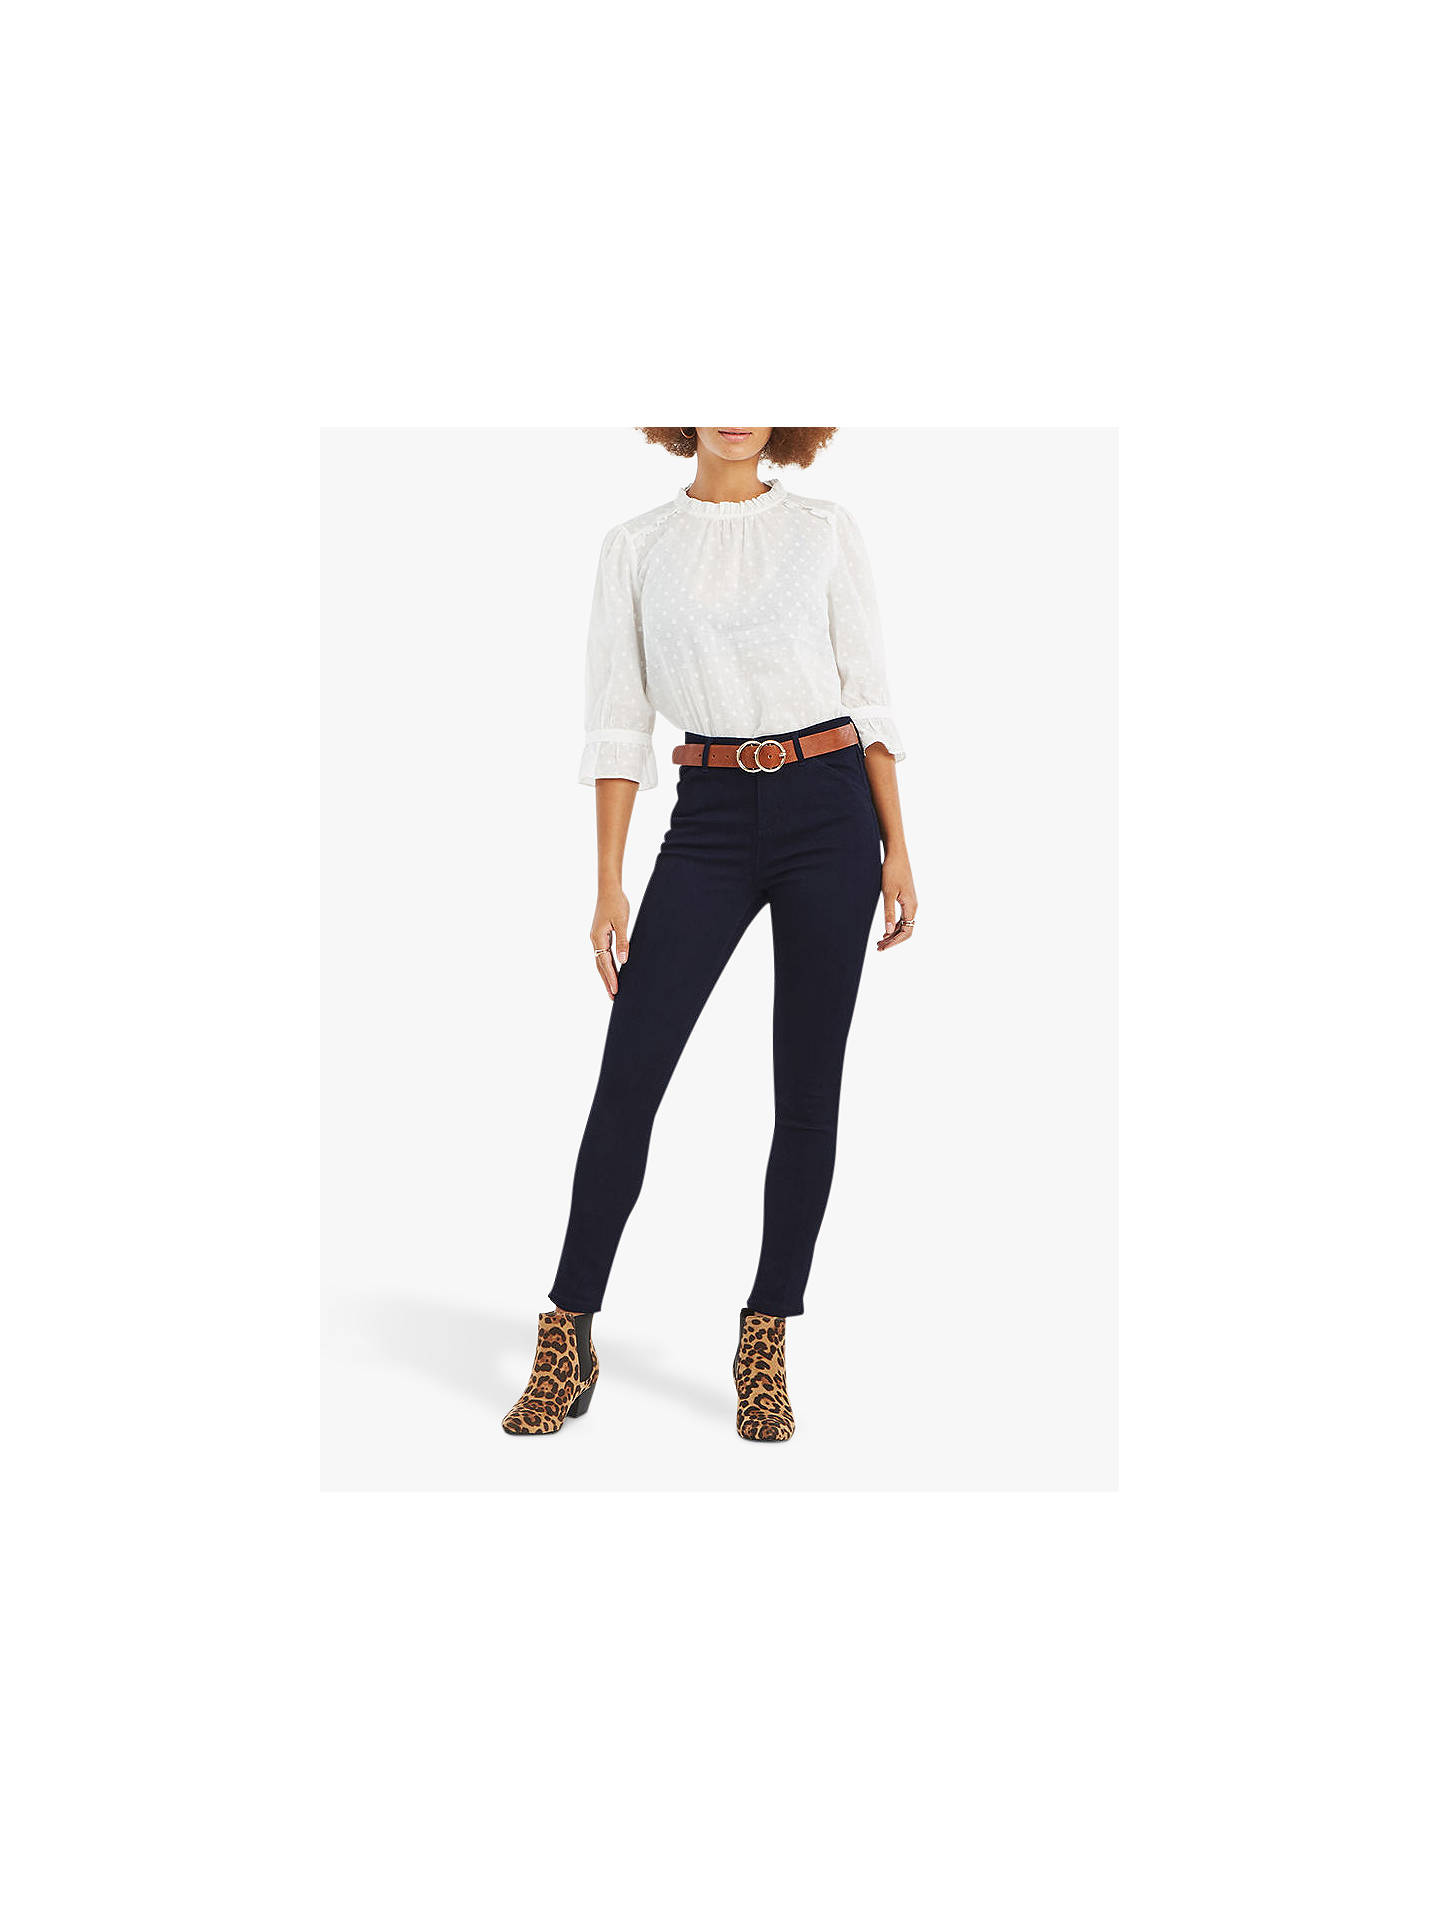 be70c6b3c395 Buy Oasis Grace Capri Jeans, Navy, 6 Online at johnlewis.com ...